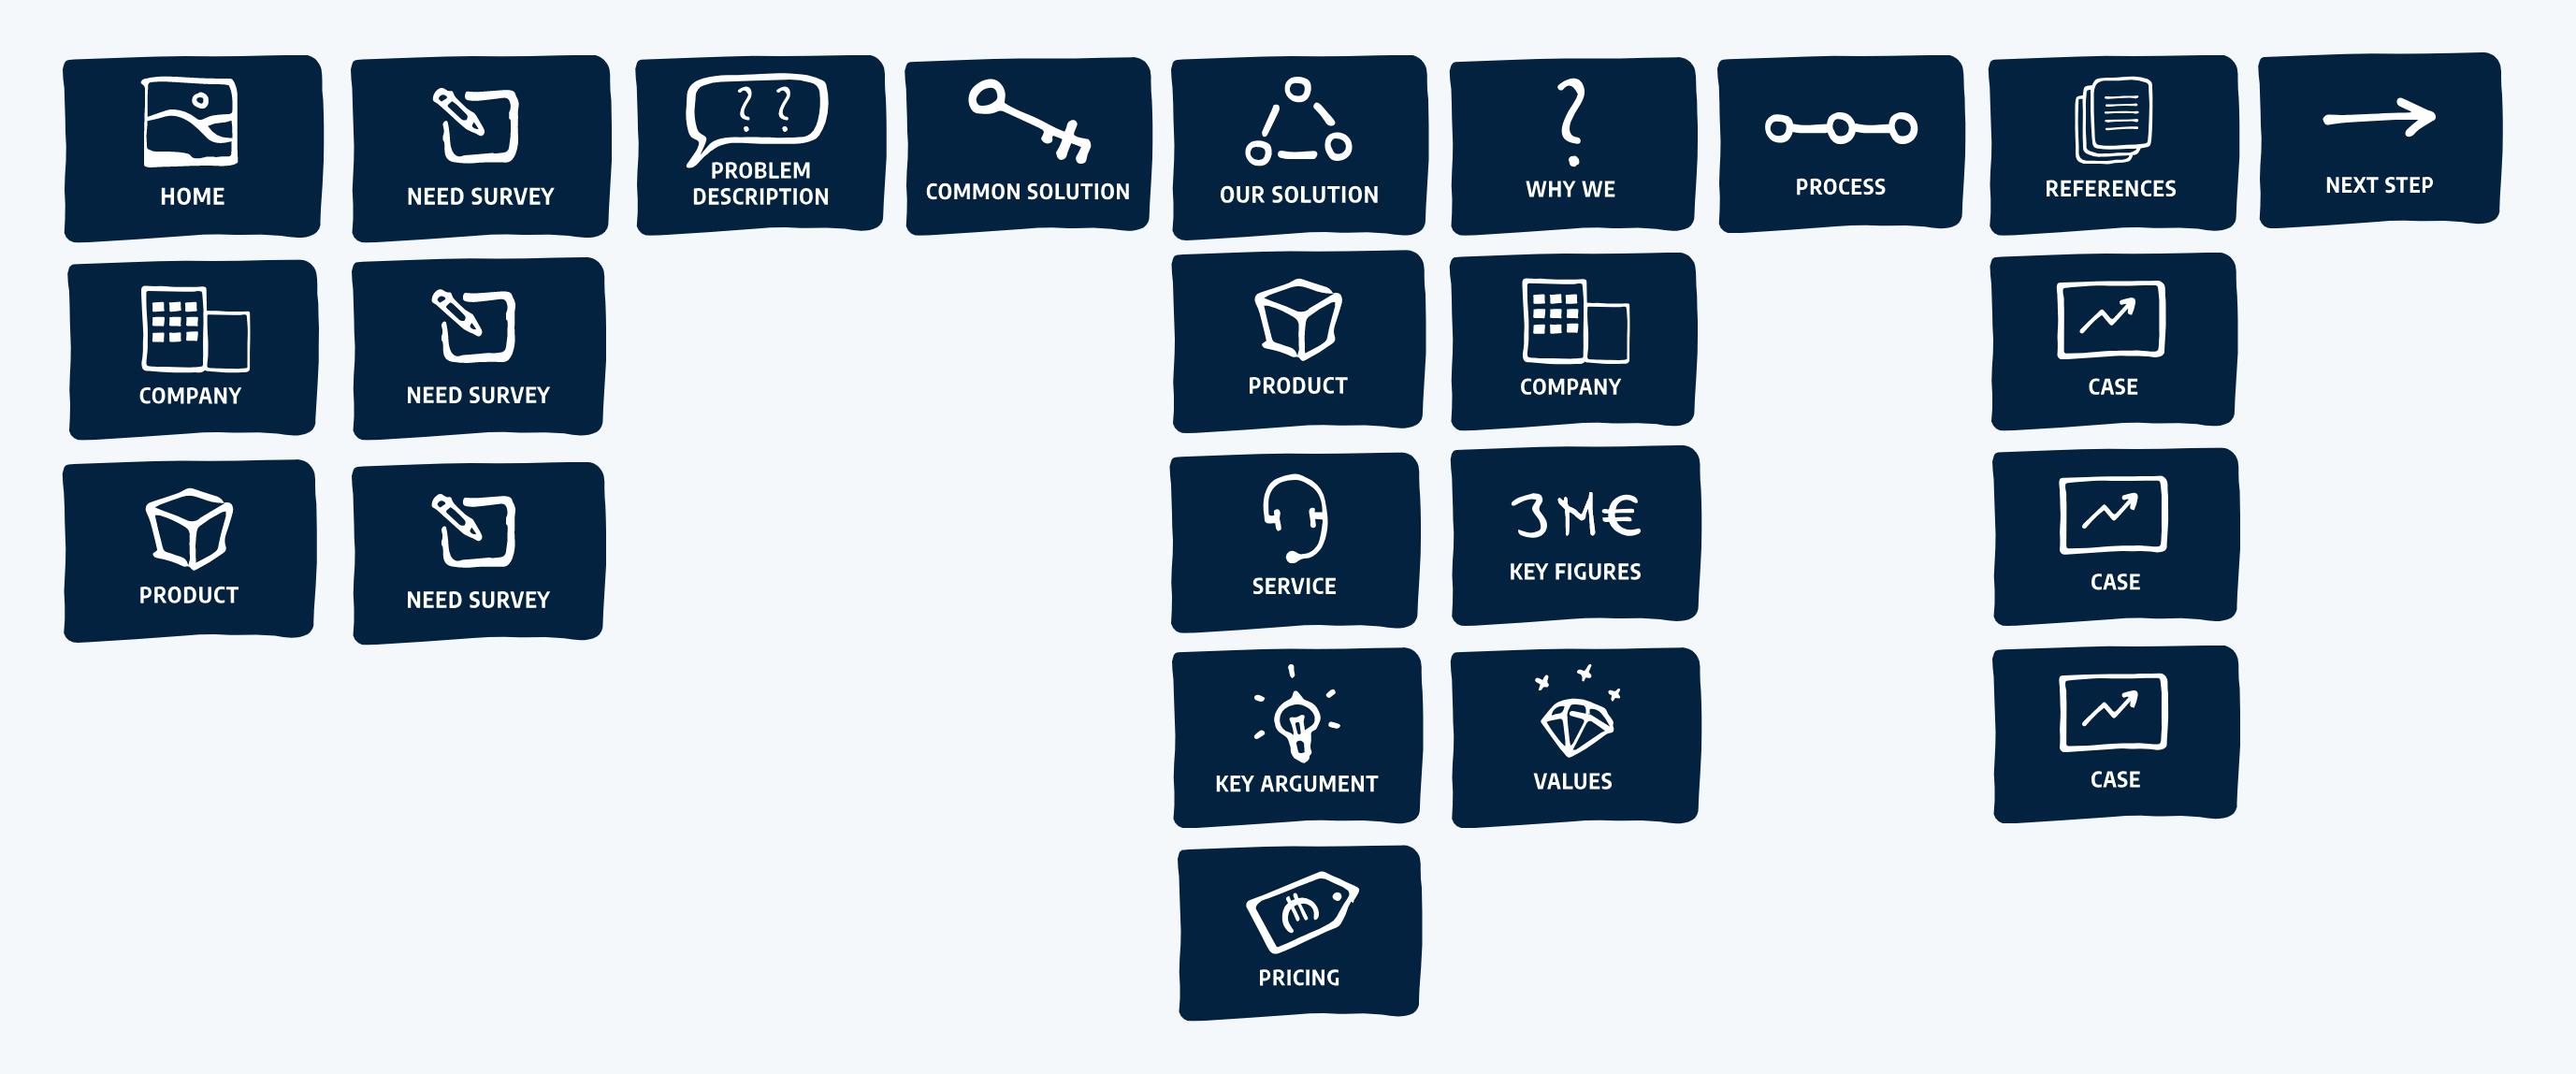 Seidat - Sales template structure